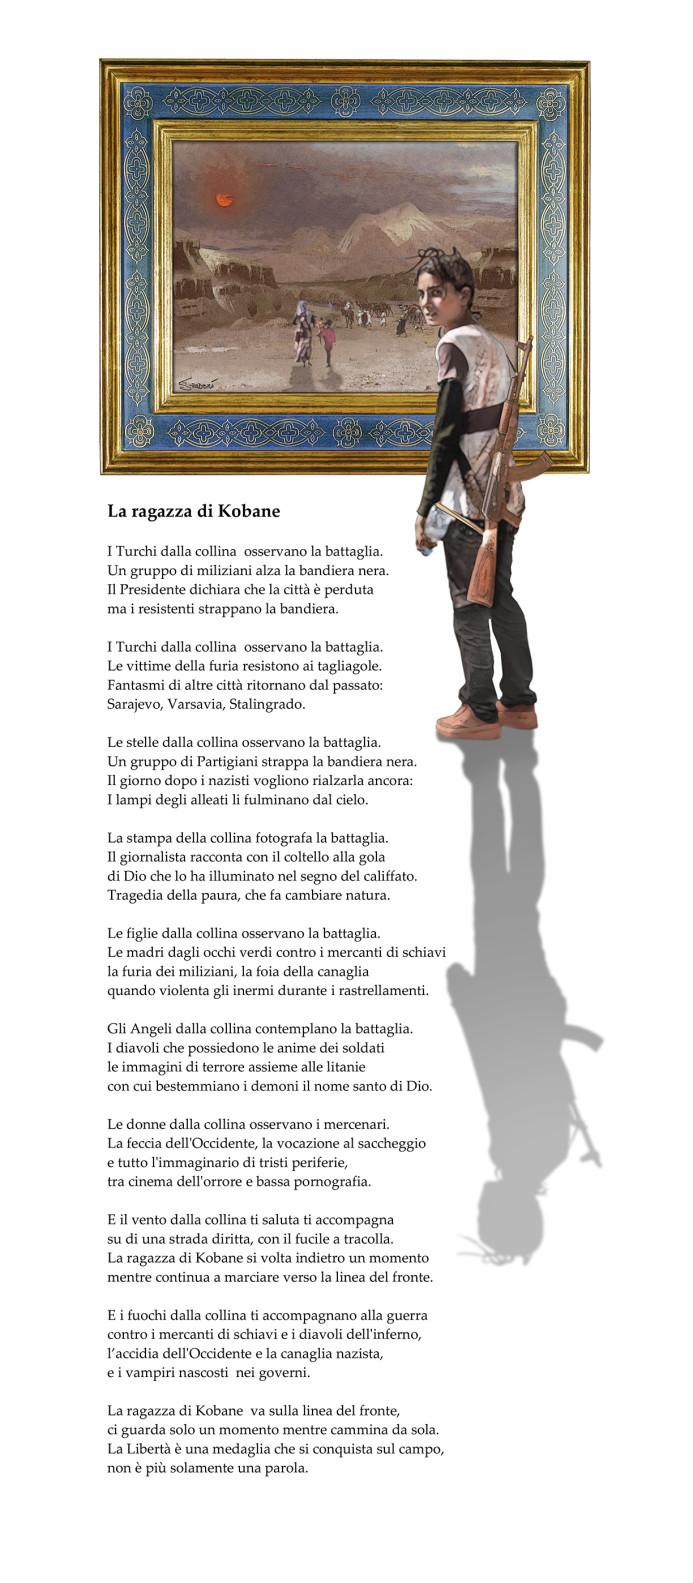 La ragazza di Kobane